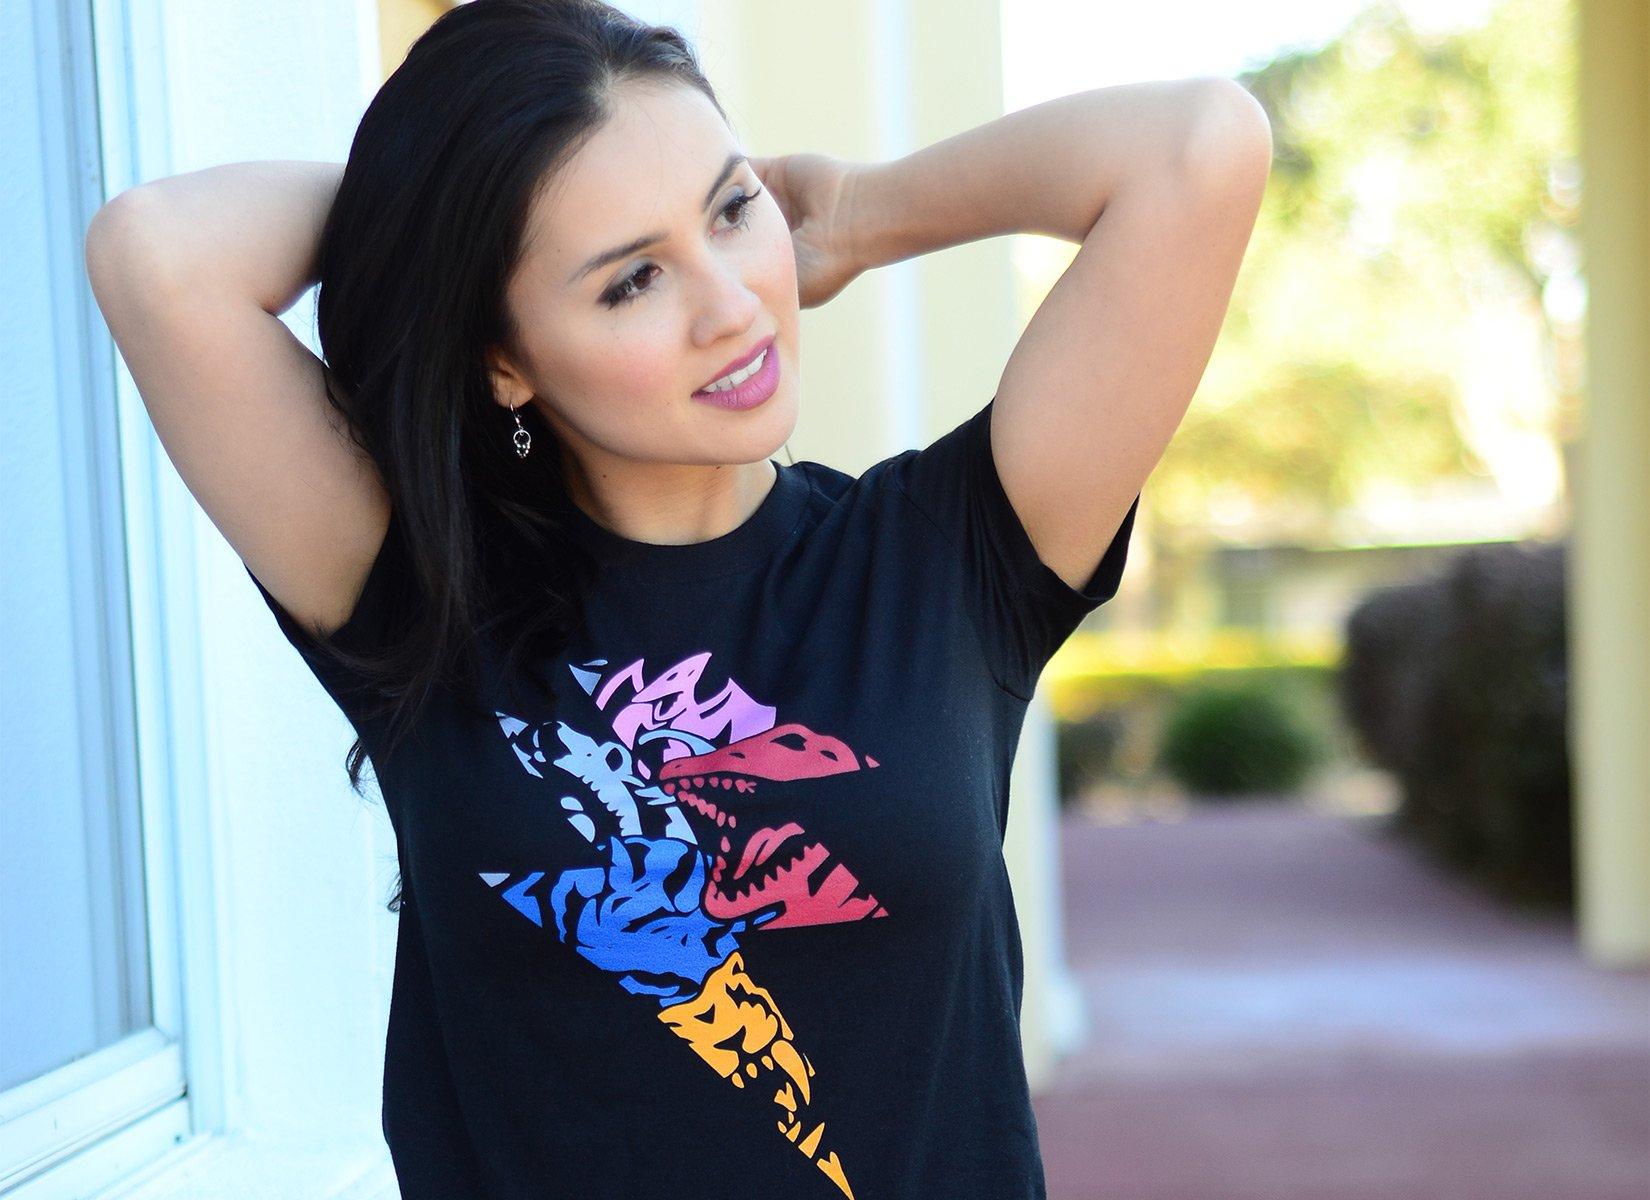 Powerzord on Juniors T-Shirt